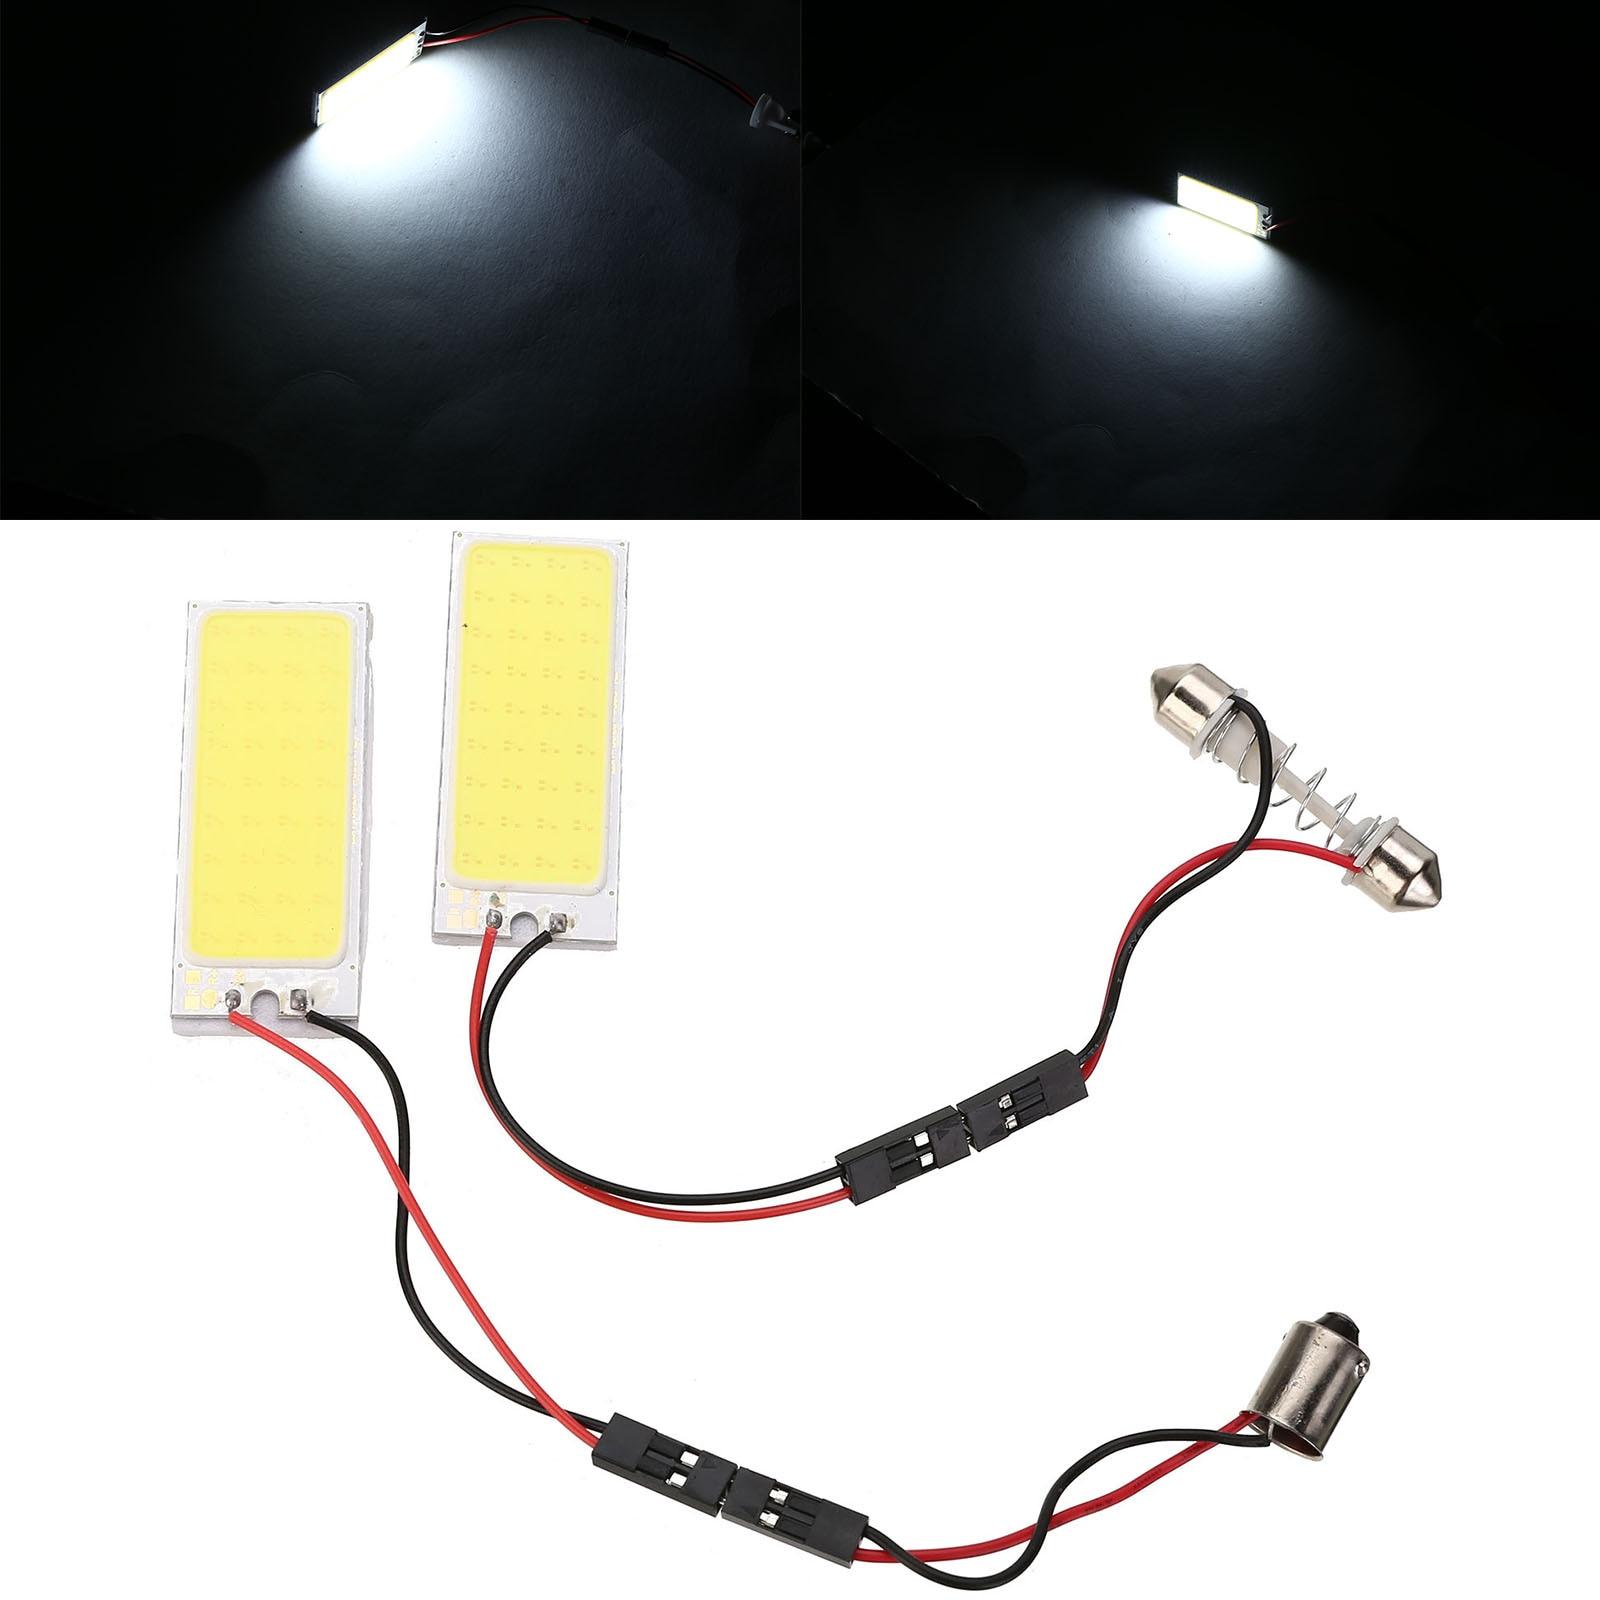 2PCS/SET 12V T10 Festoon Car Interior Light 6W 36 SMD COB LED Auto Dome Panel BA9S Light Bulb DC 12V Super White 31 4w 4x5050 t10 car festoon white light led bulb dc 12v